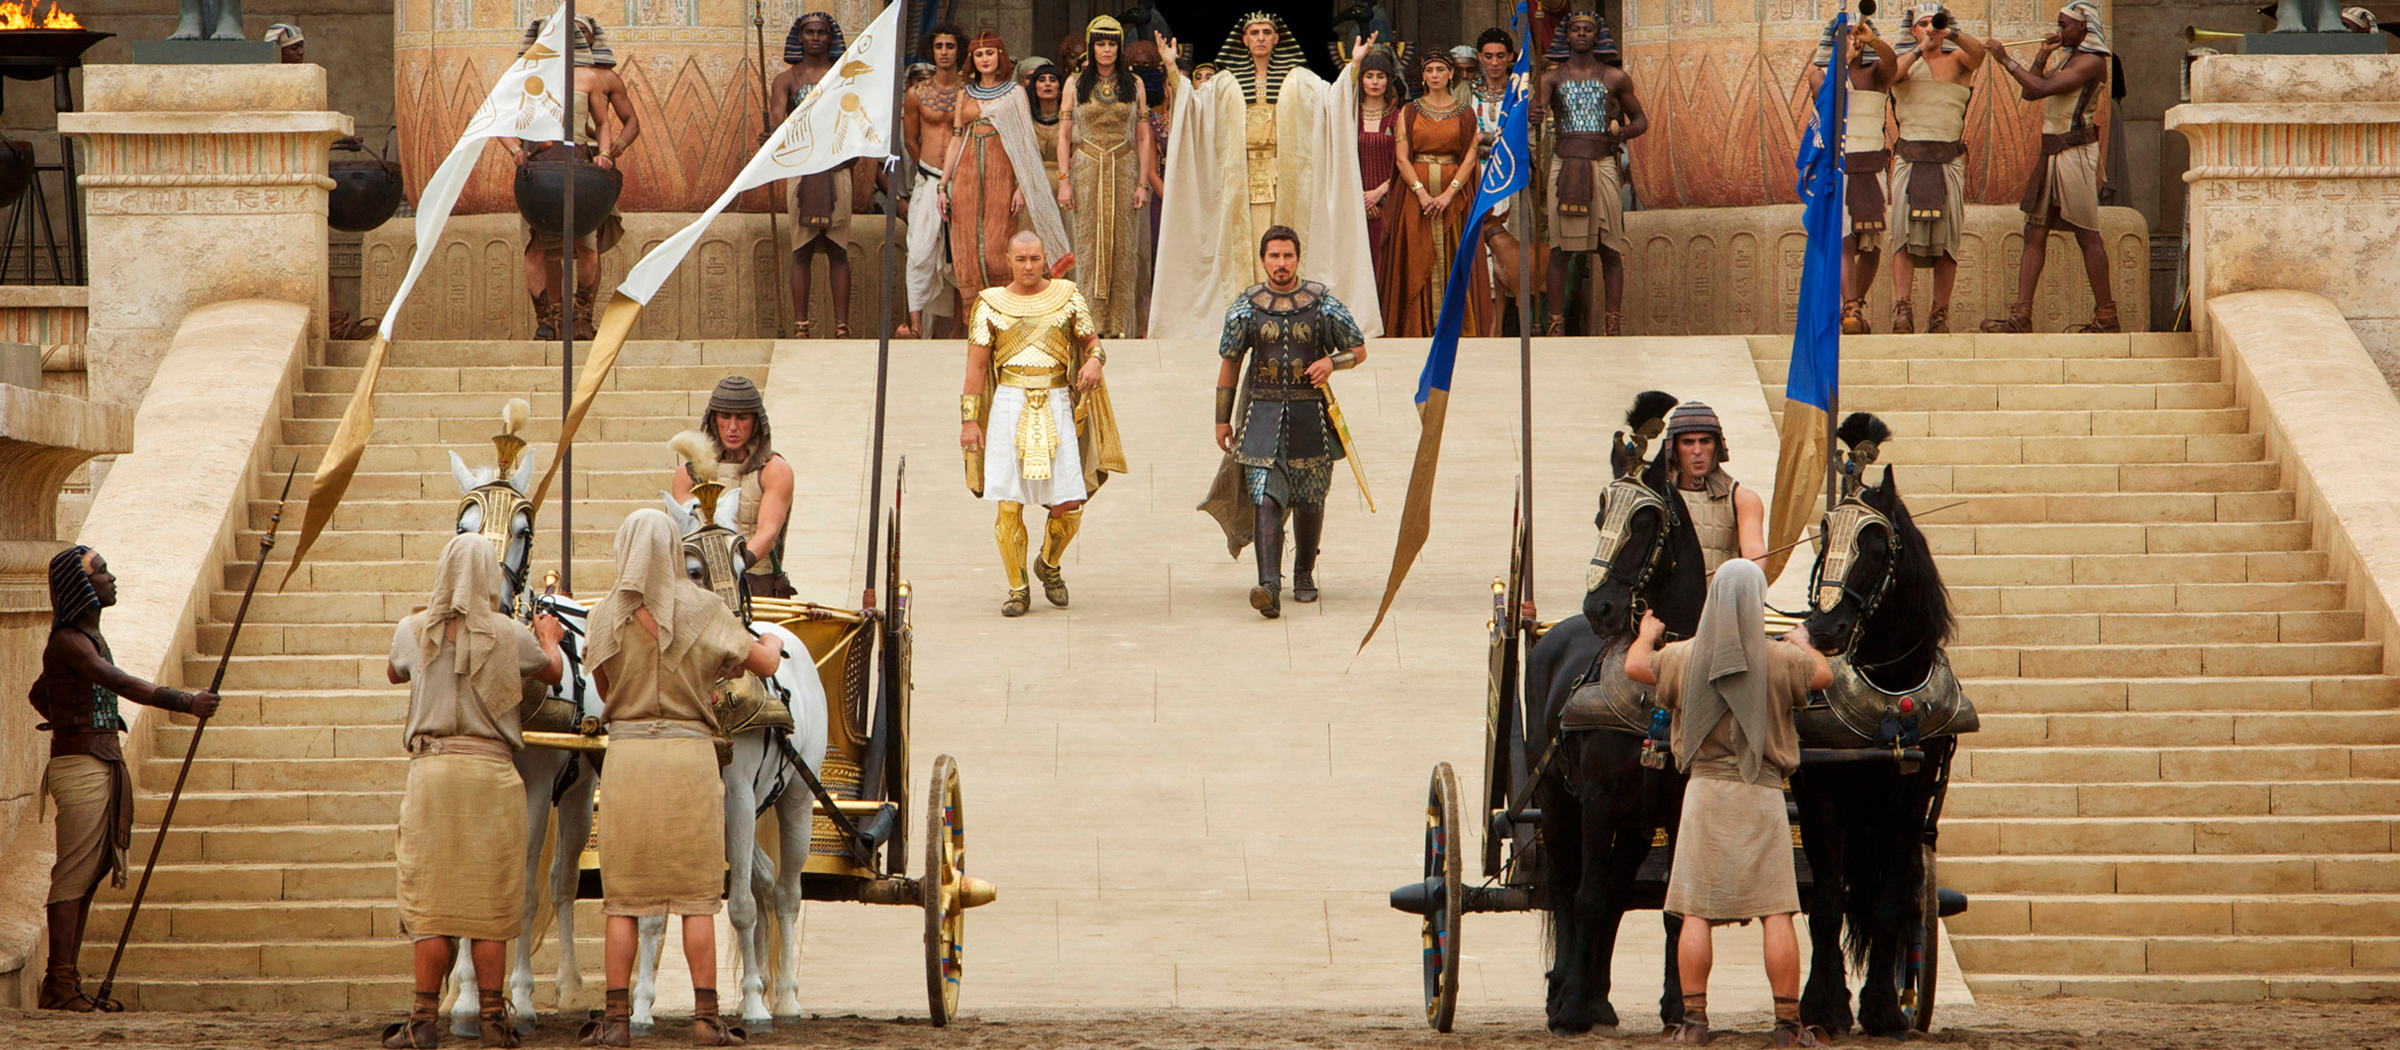 Exodus Götter Und Könige Andalucía Destino De Cine